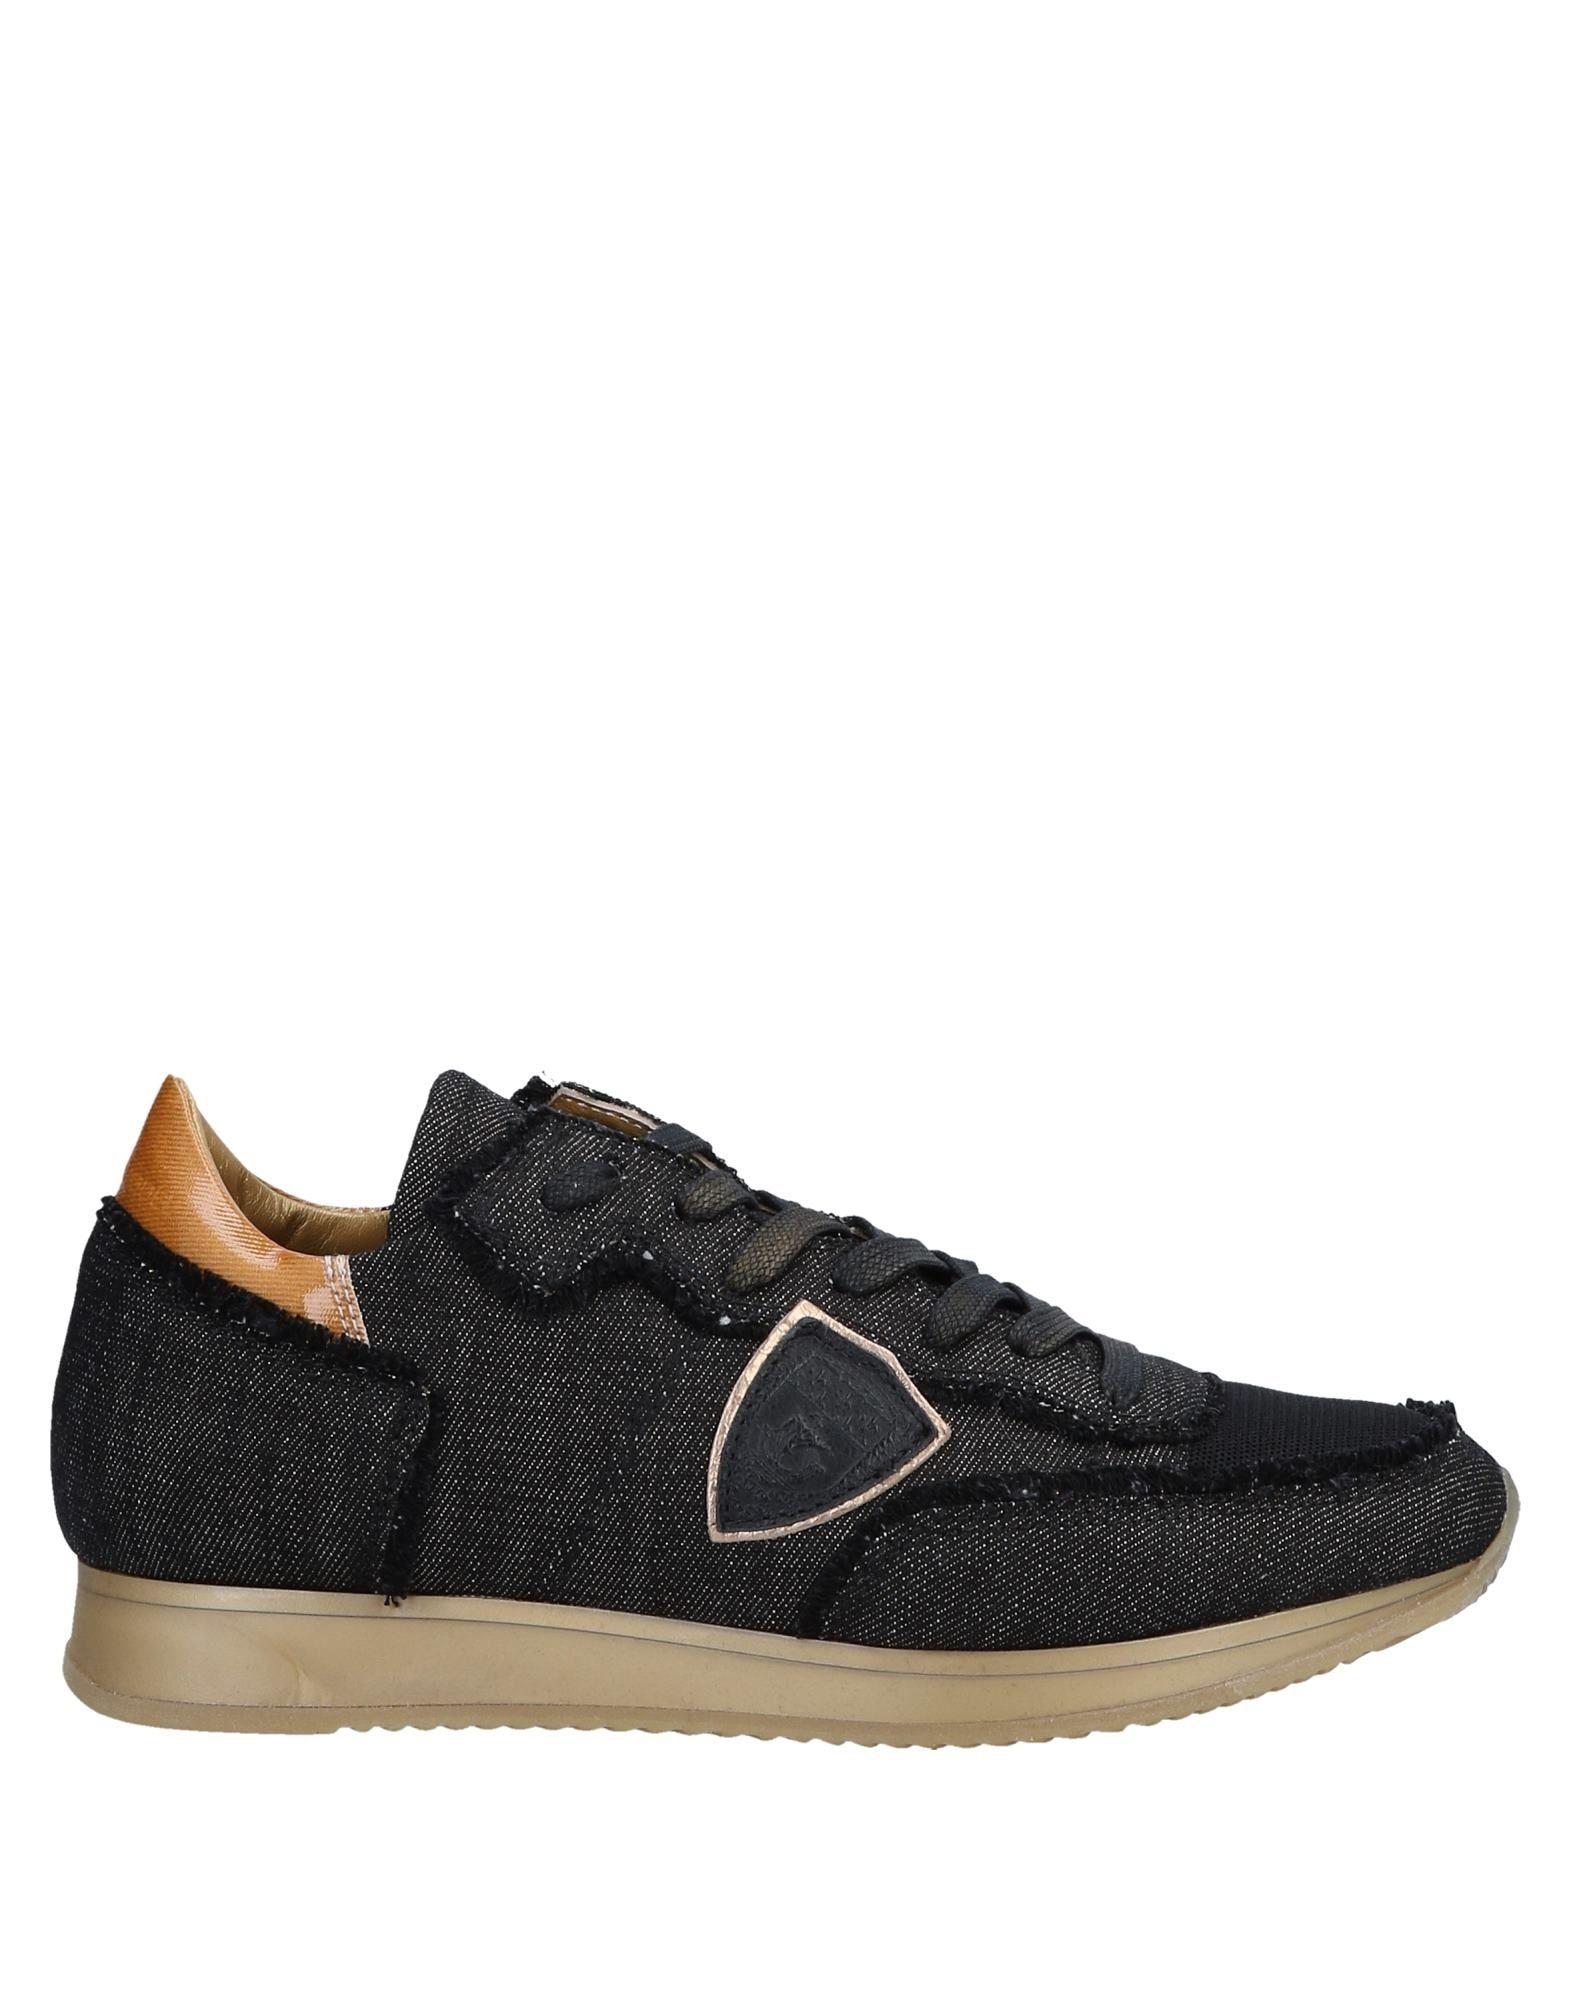 Philippe Model Sneakers Sneakers - Women Philippe Model Sneakers Sneakers online on  Canada - 11565538MG dd3be4